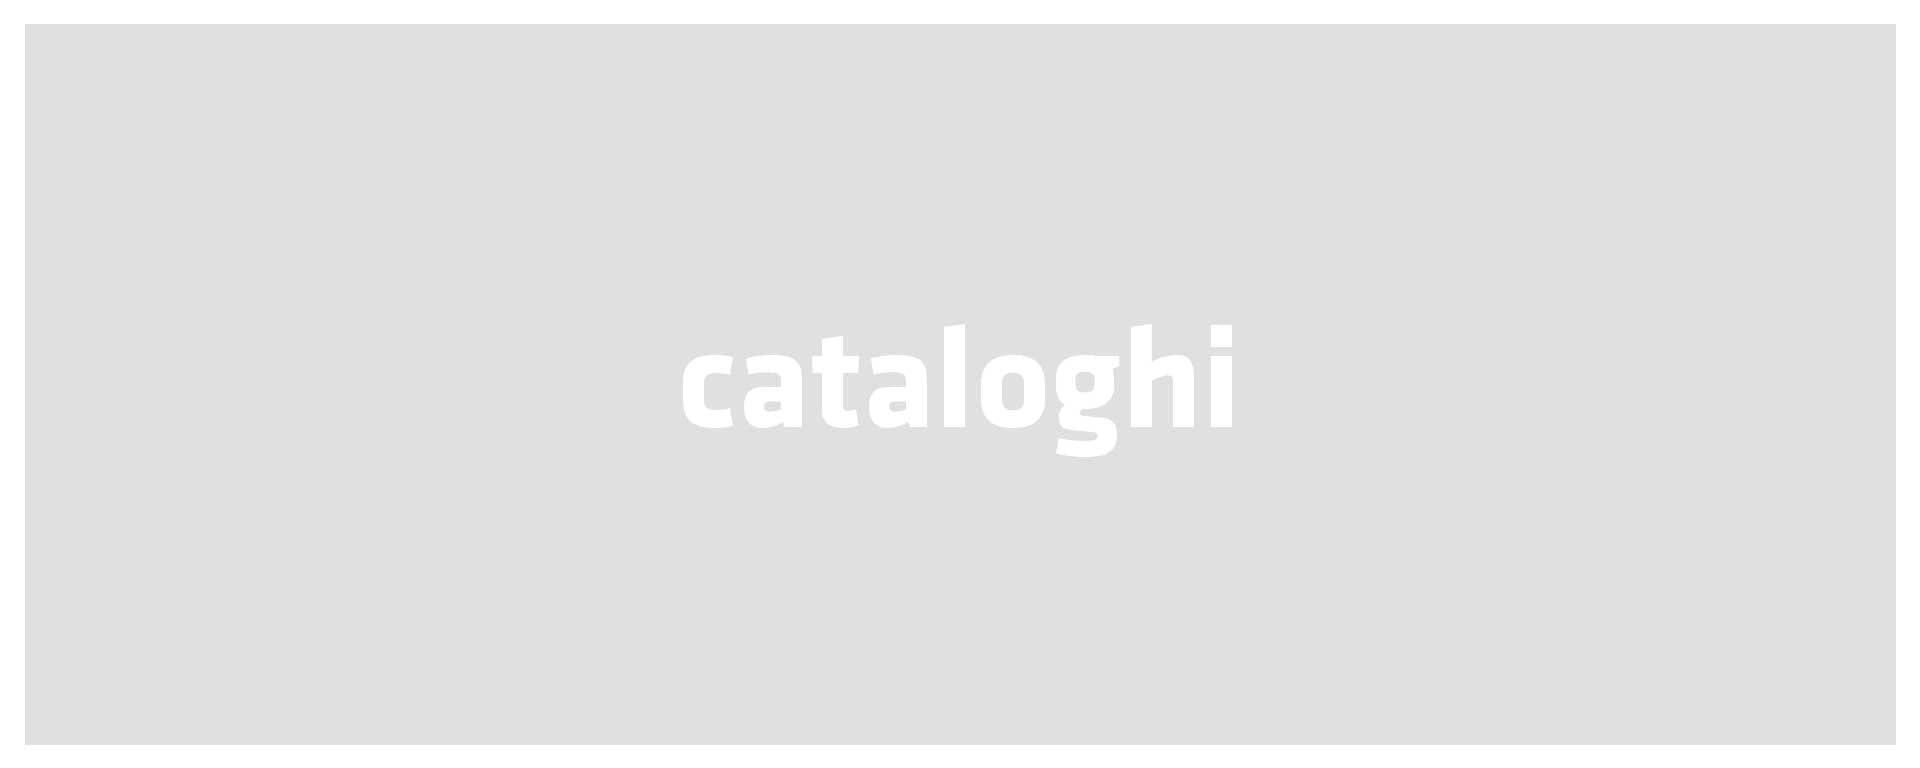 cataloghi-marmo_